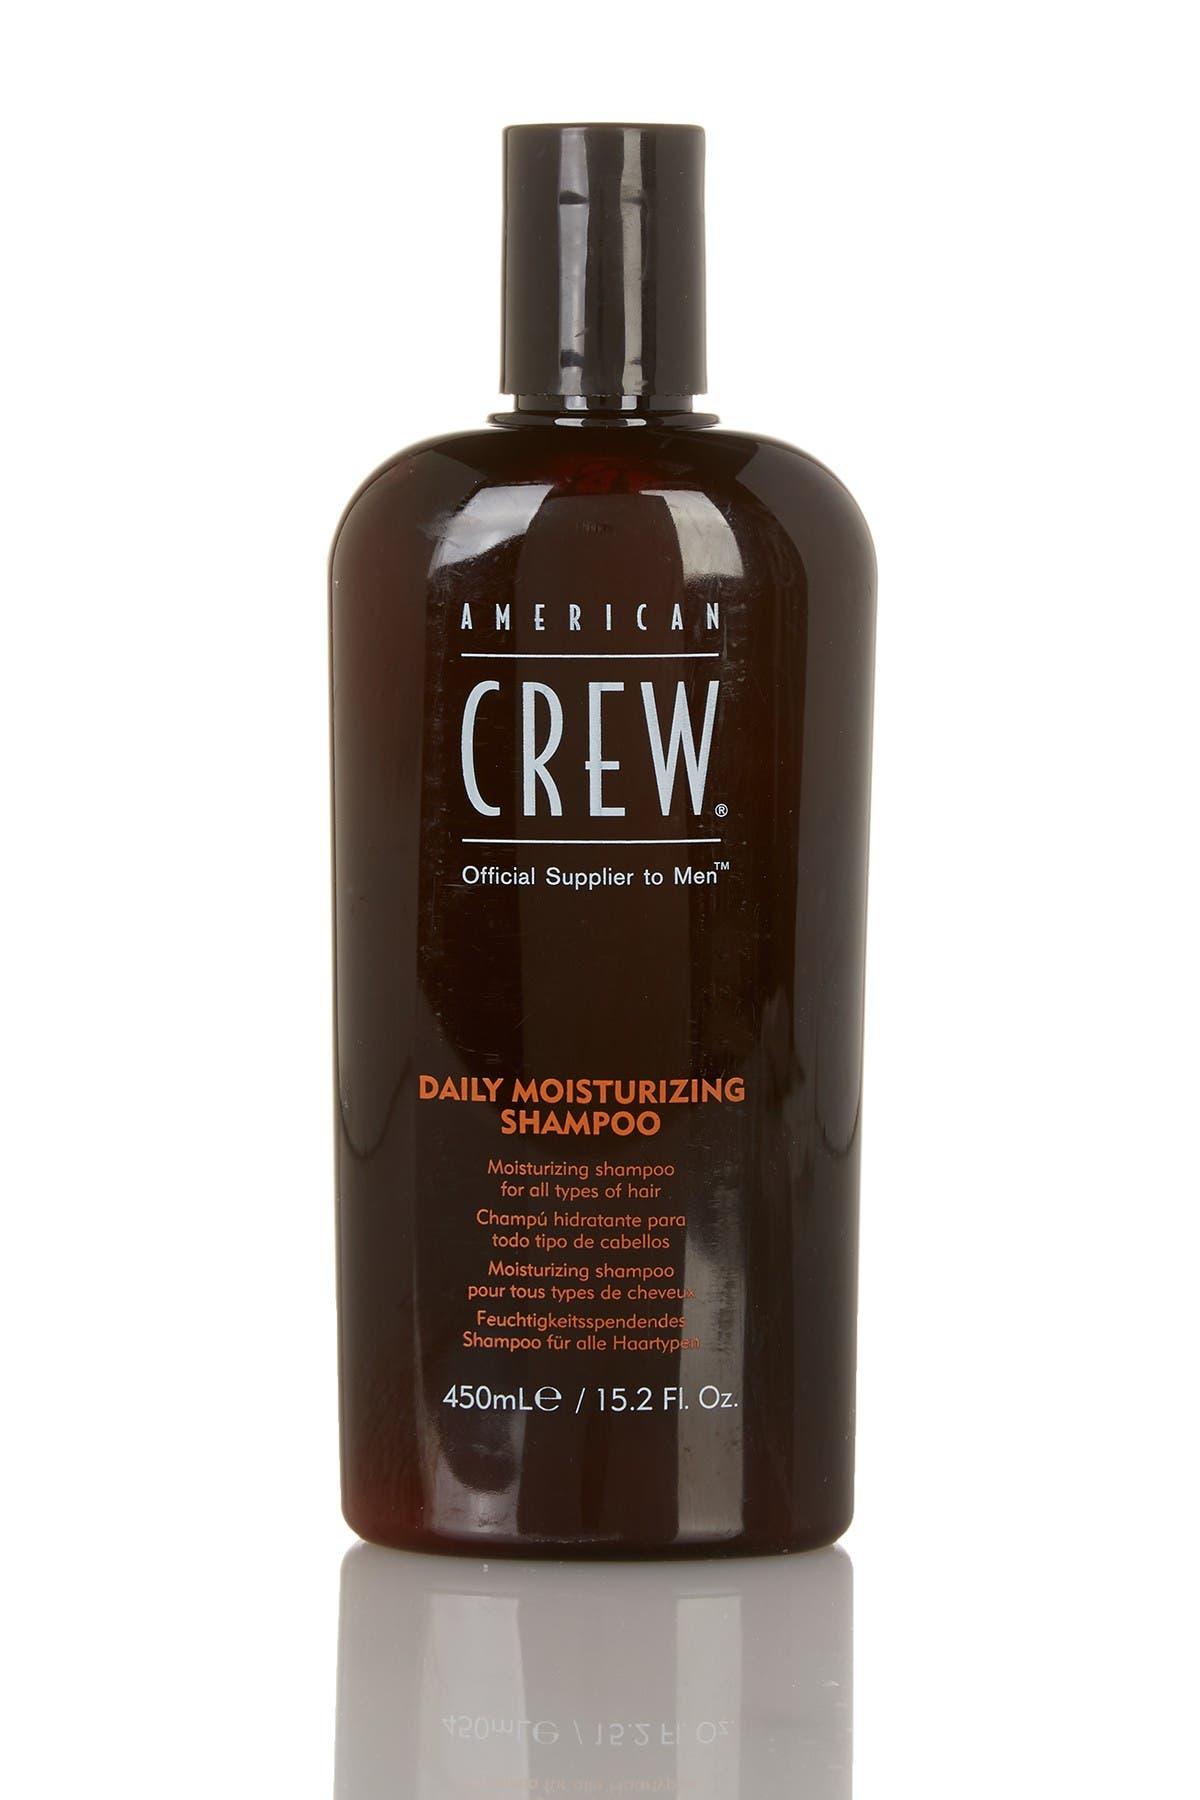 Image of American Crew Daily Moist Shampoo - 15.2 oz.